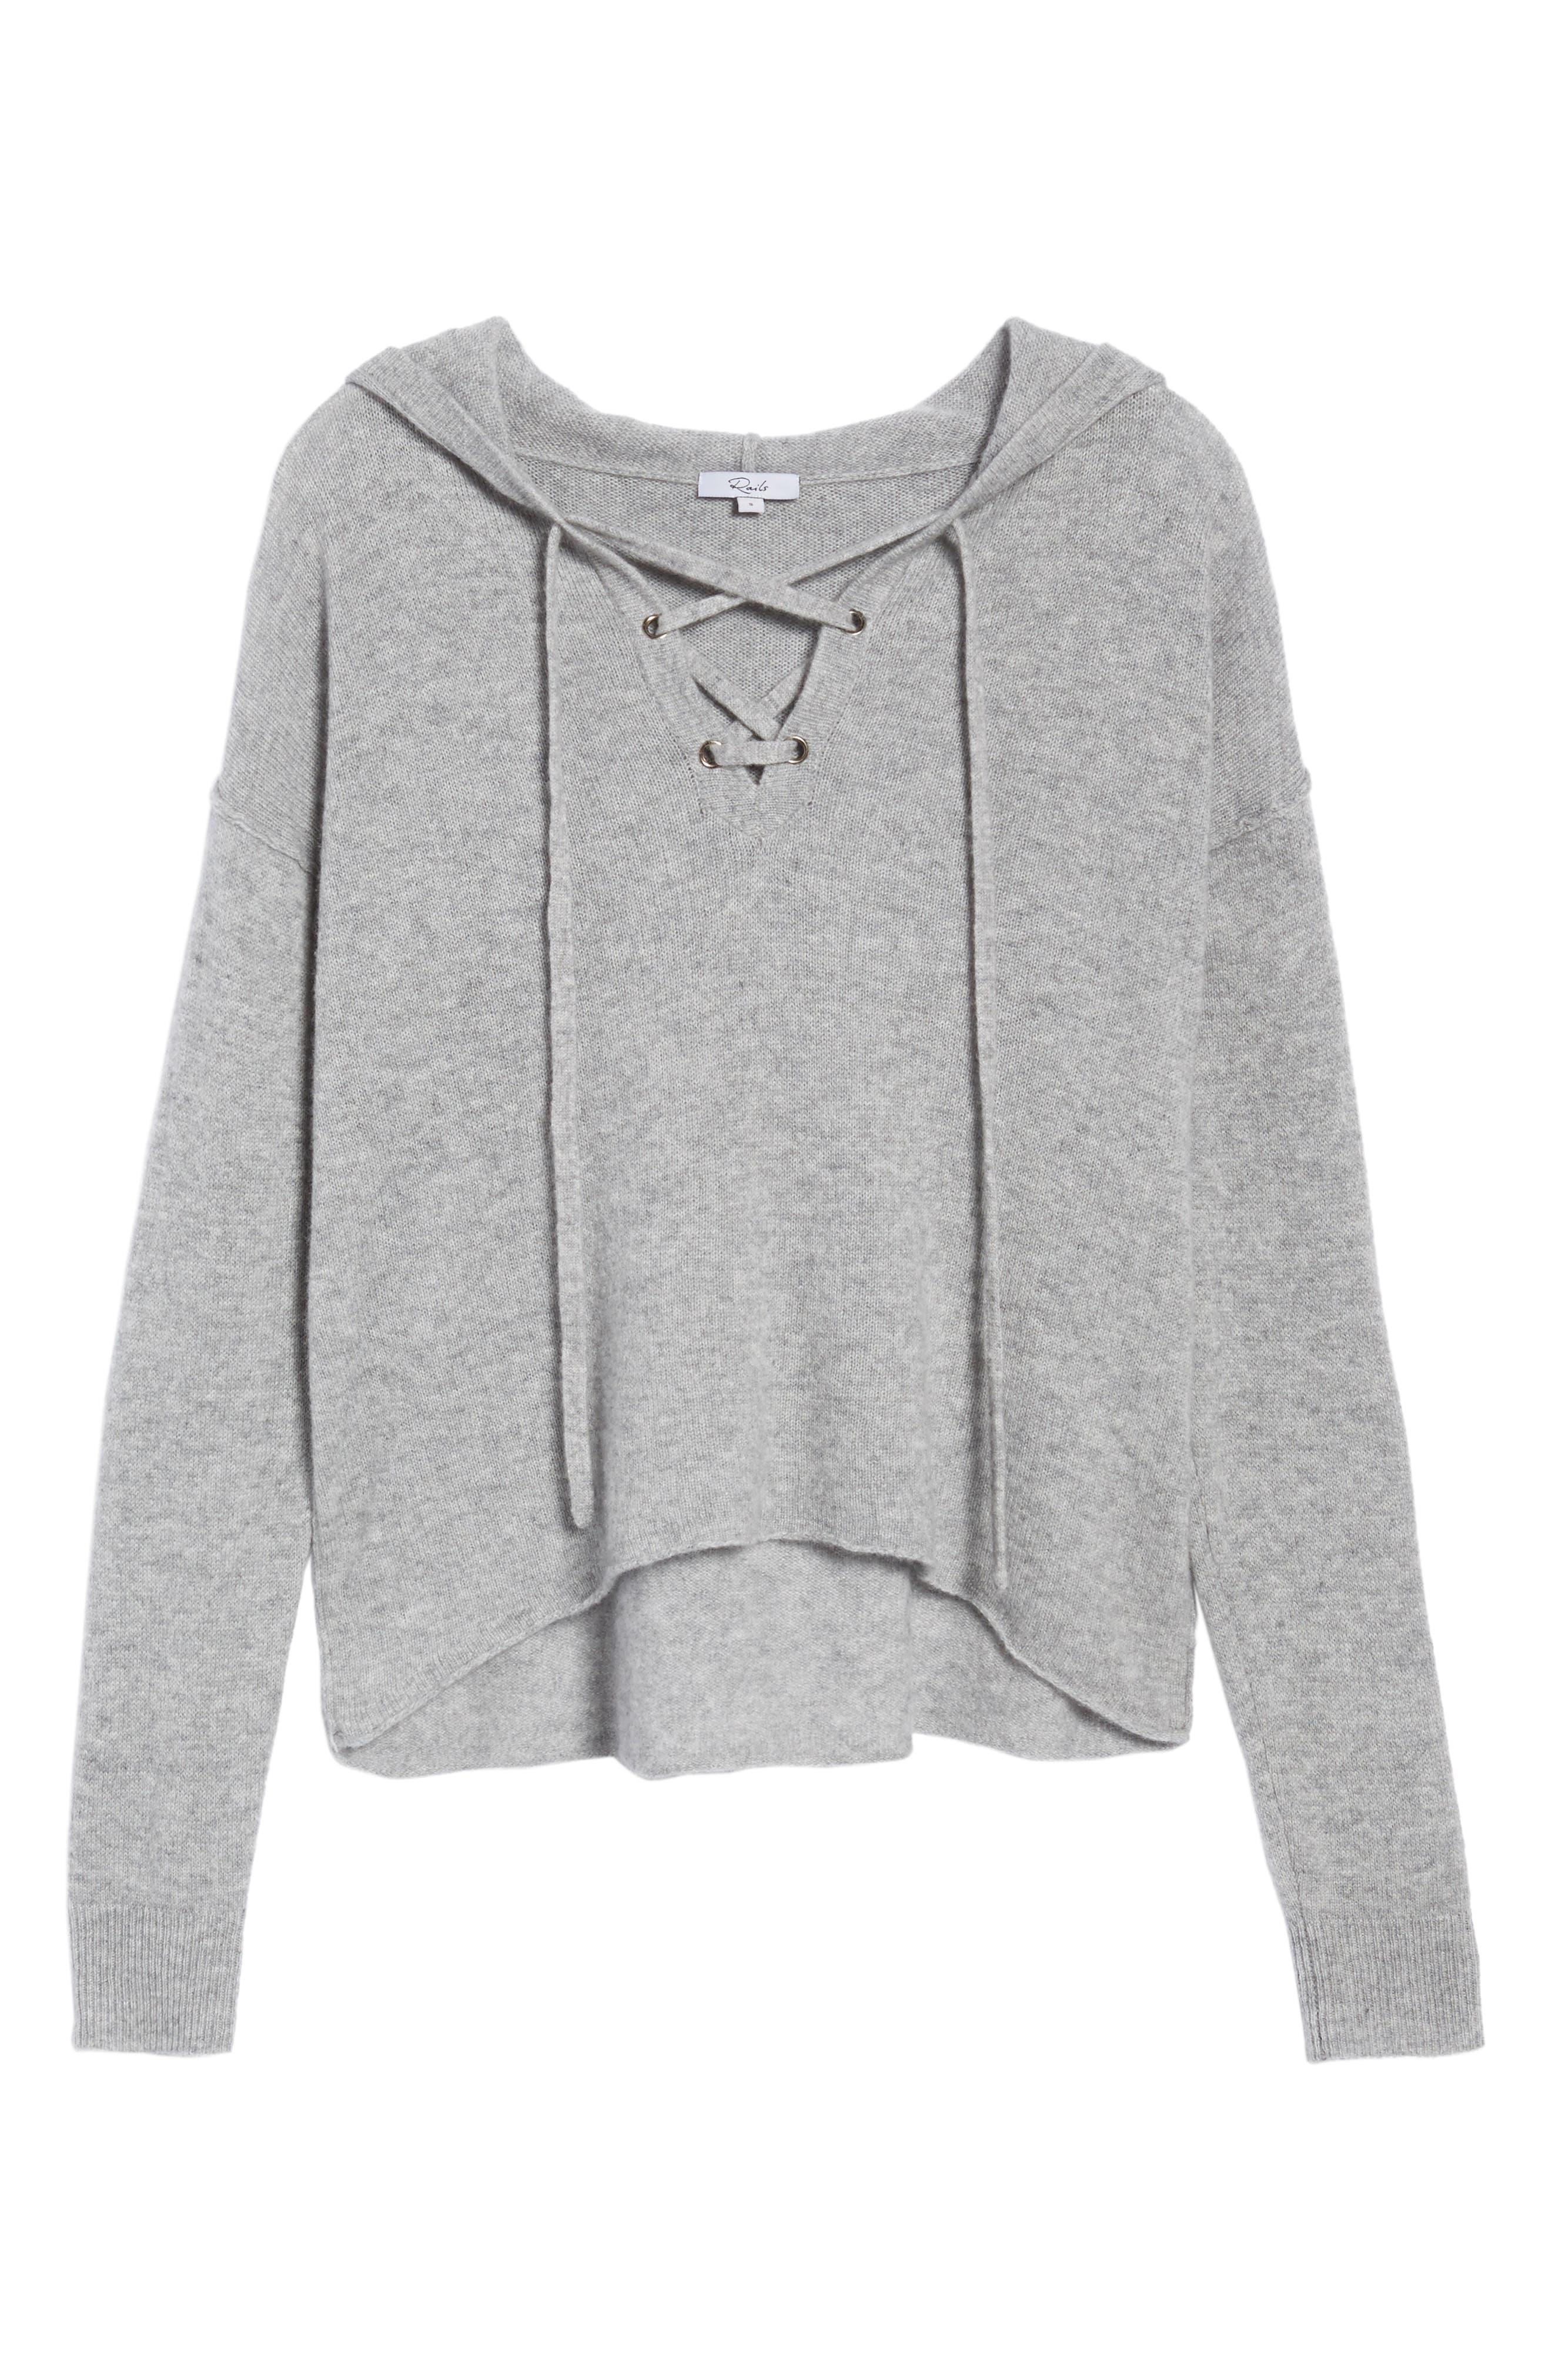 Dakota Cashmere Hooded Sweater,                             Alternate thumbnail 6, color,                             052